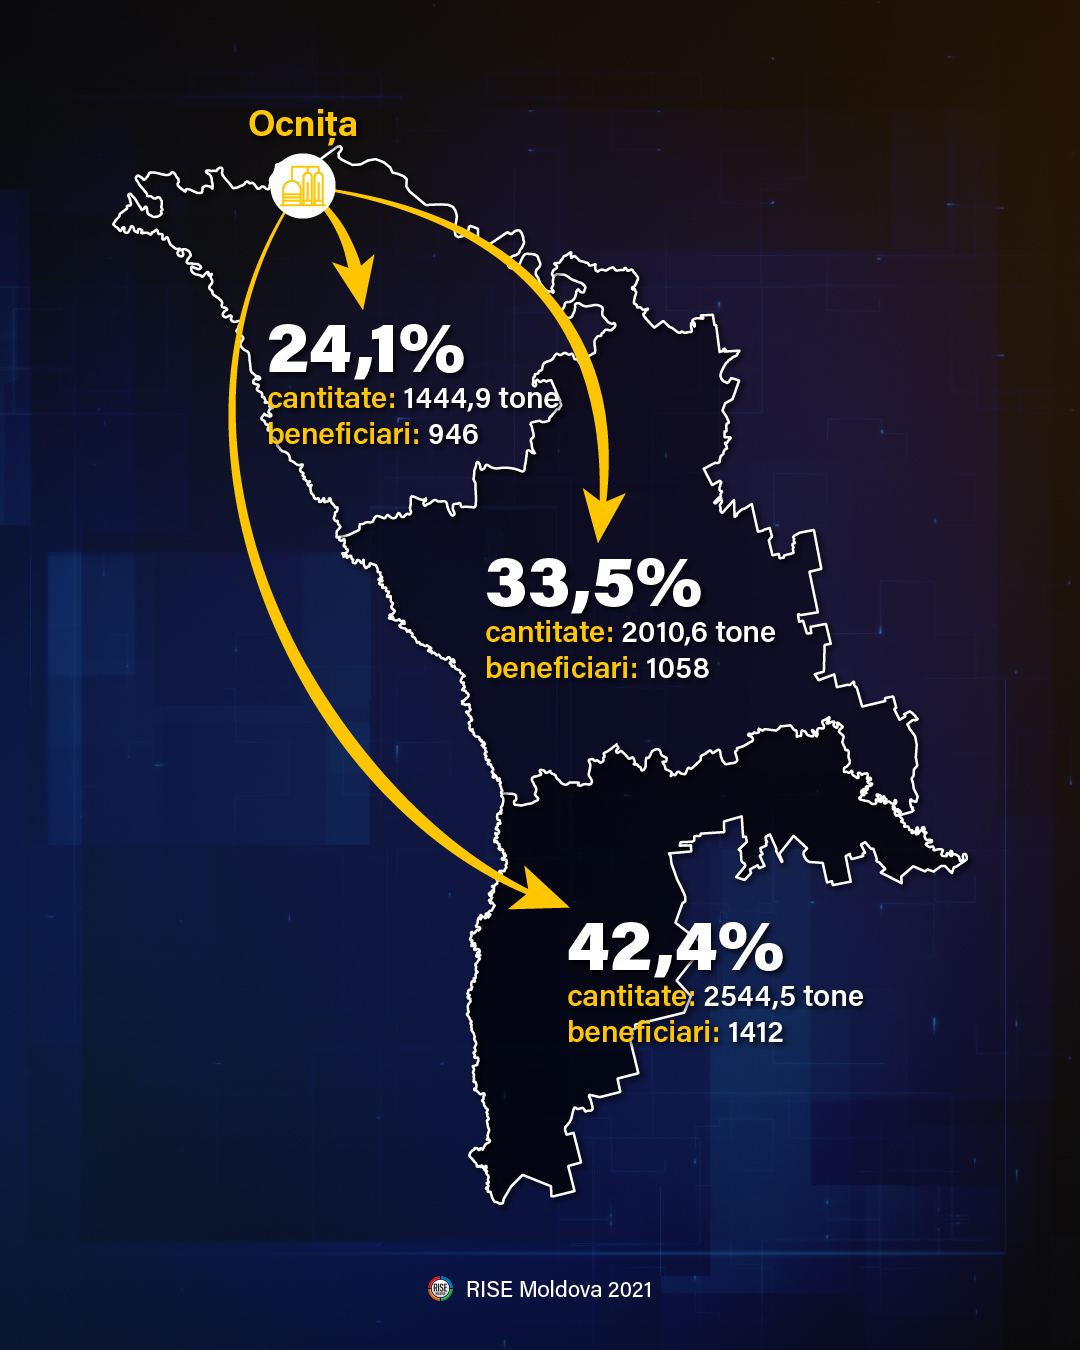 distributia-motorinei-pe-regiuni-grafic-rise-moldova